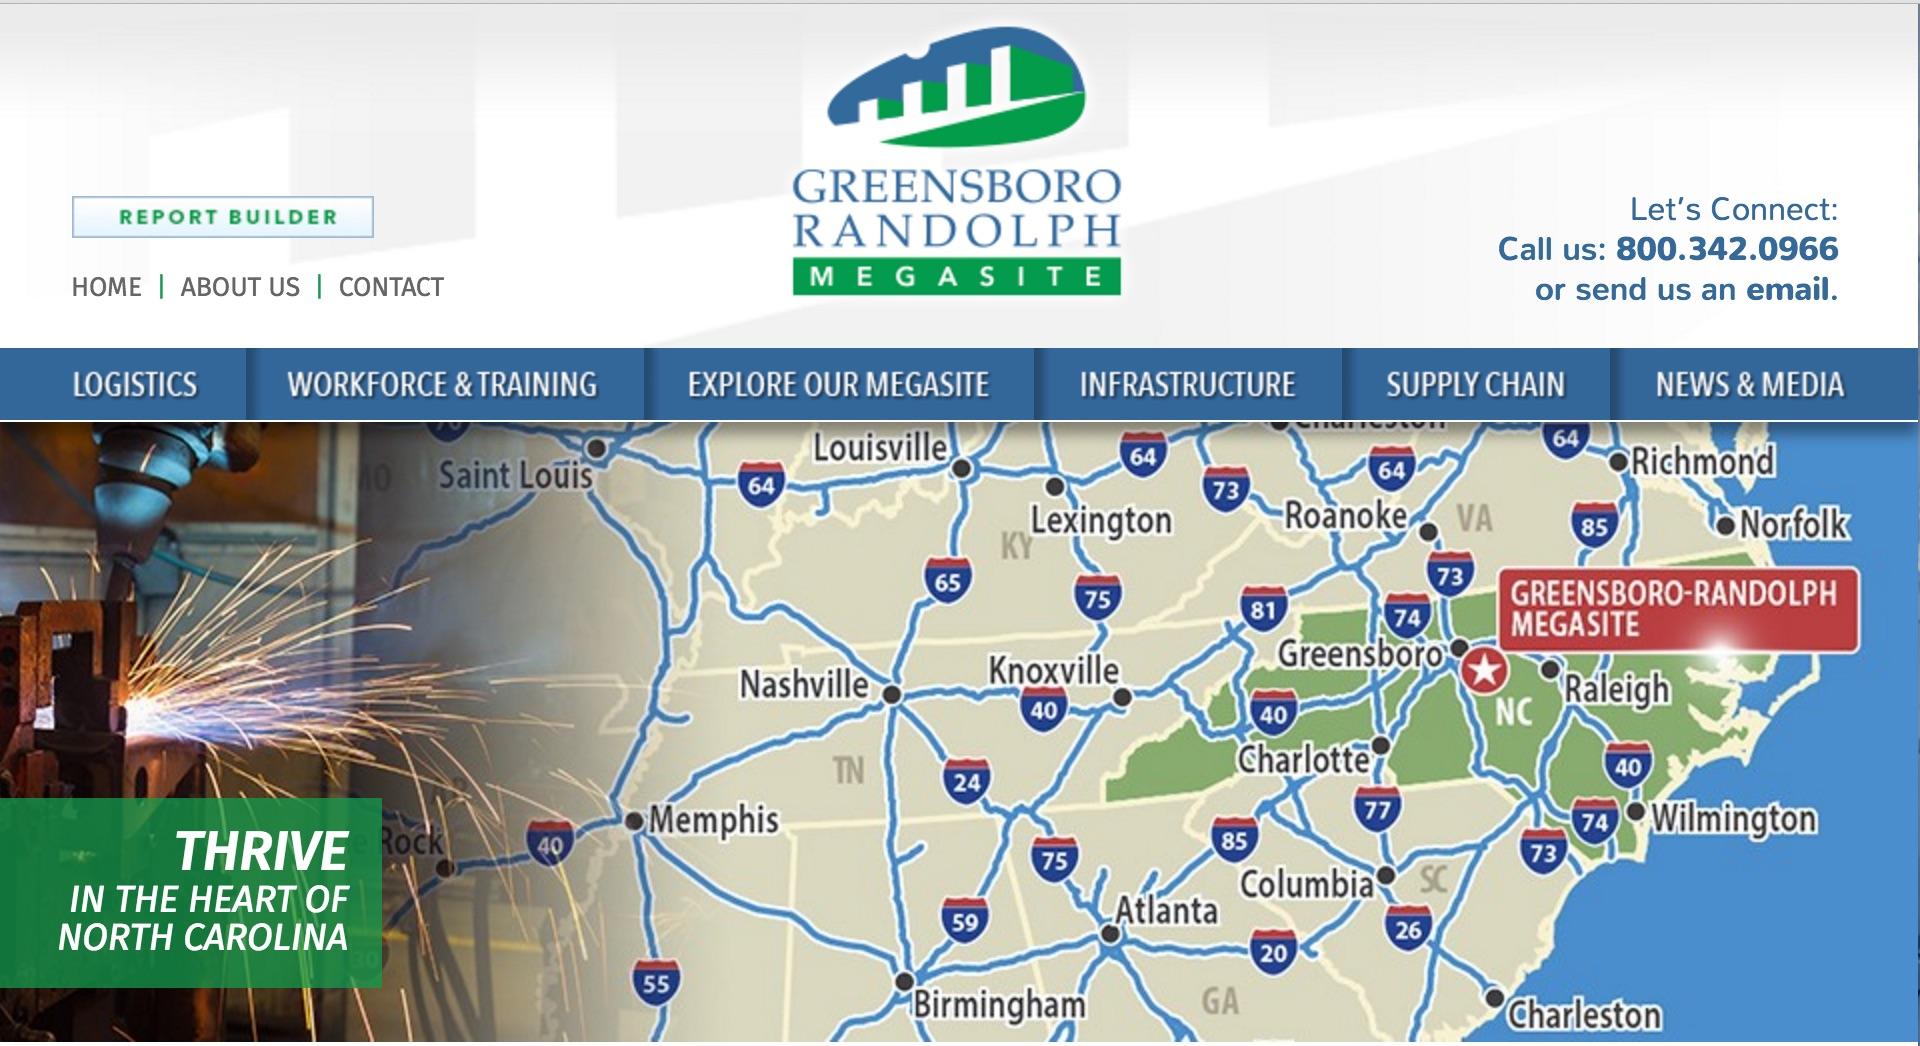 Greensboro randolph megasite